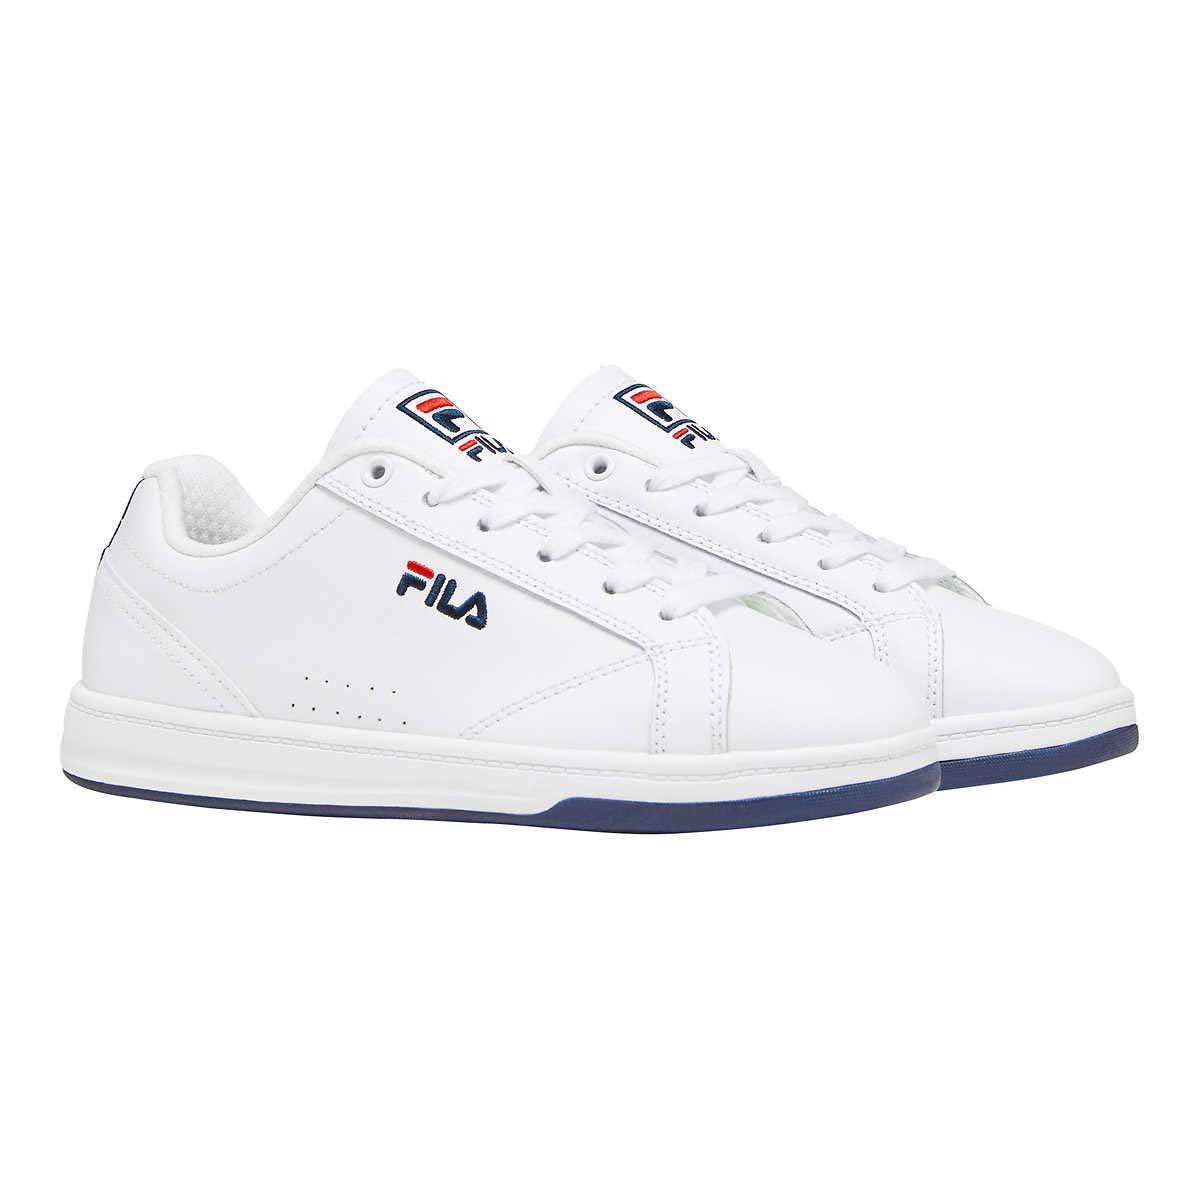 fila casual shoes white